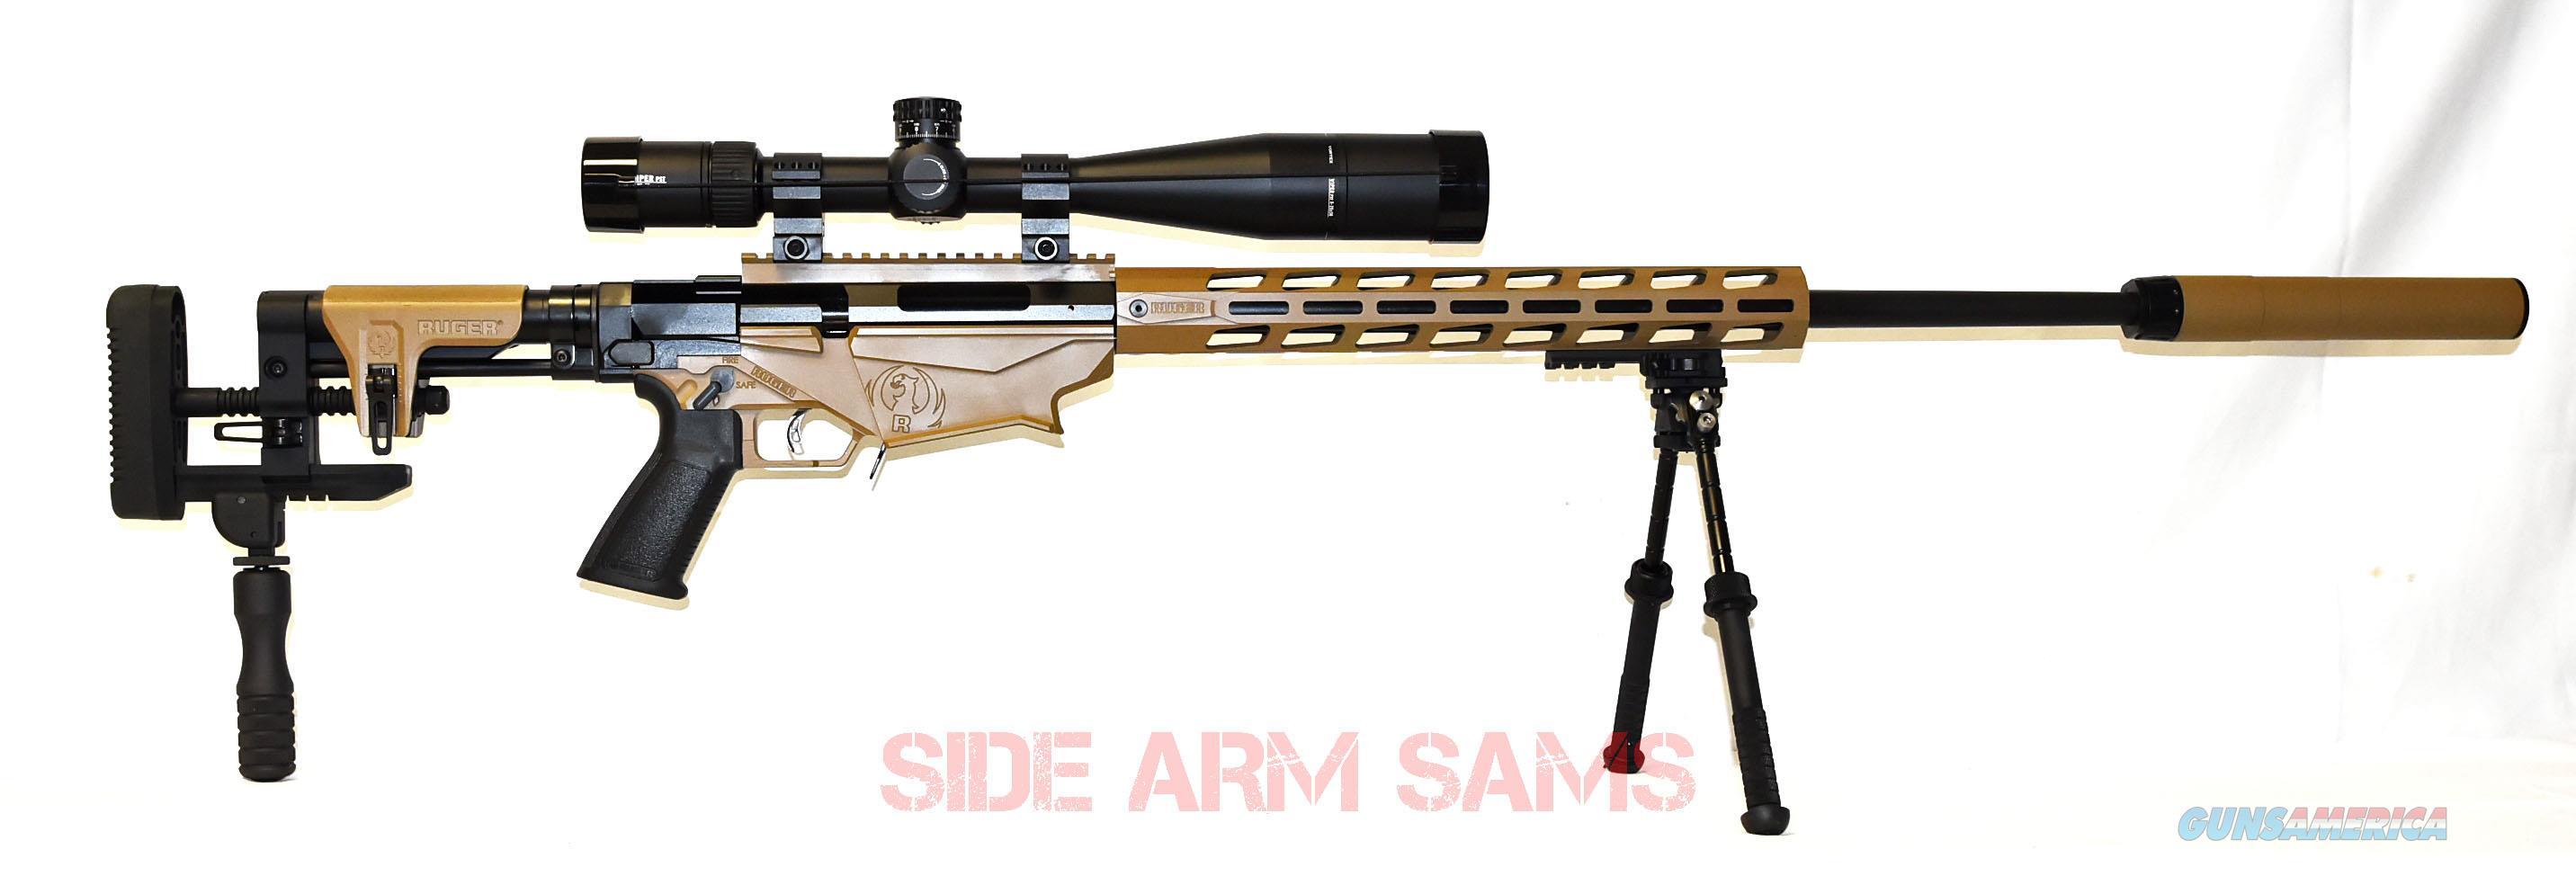 NIB Ruger PRS,6.5CM,Vortex MRAD,Atlas,Bowers 30t Silencer in Barrett Brown   Guns > Rifles > Ruger Rifles > Precision Rifle Series